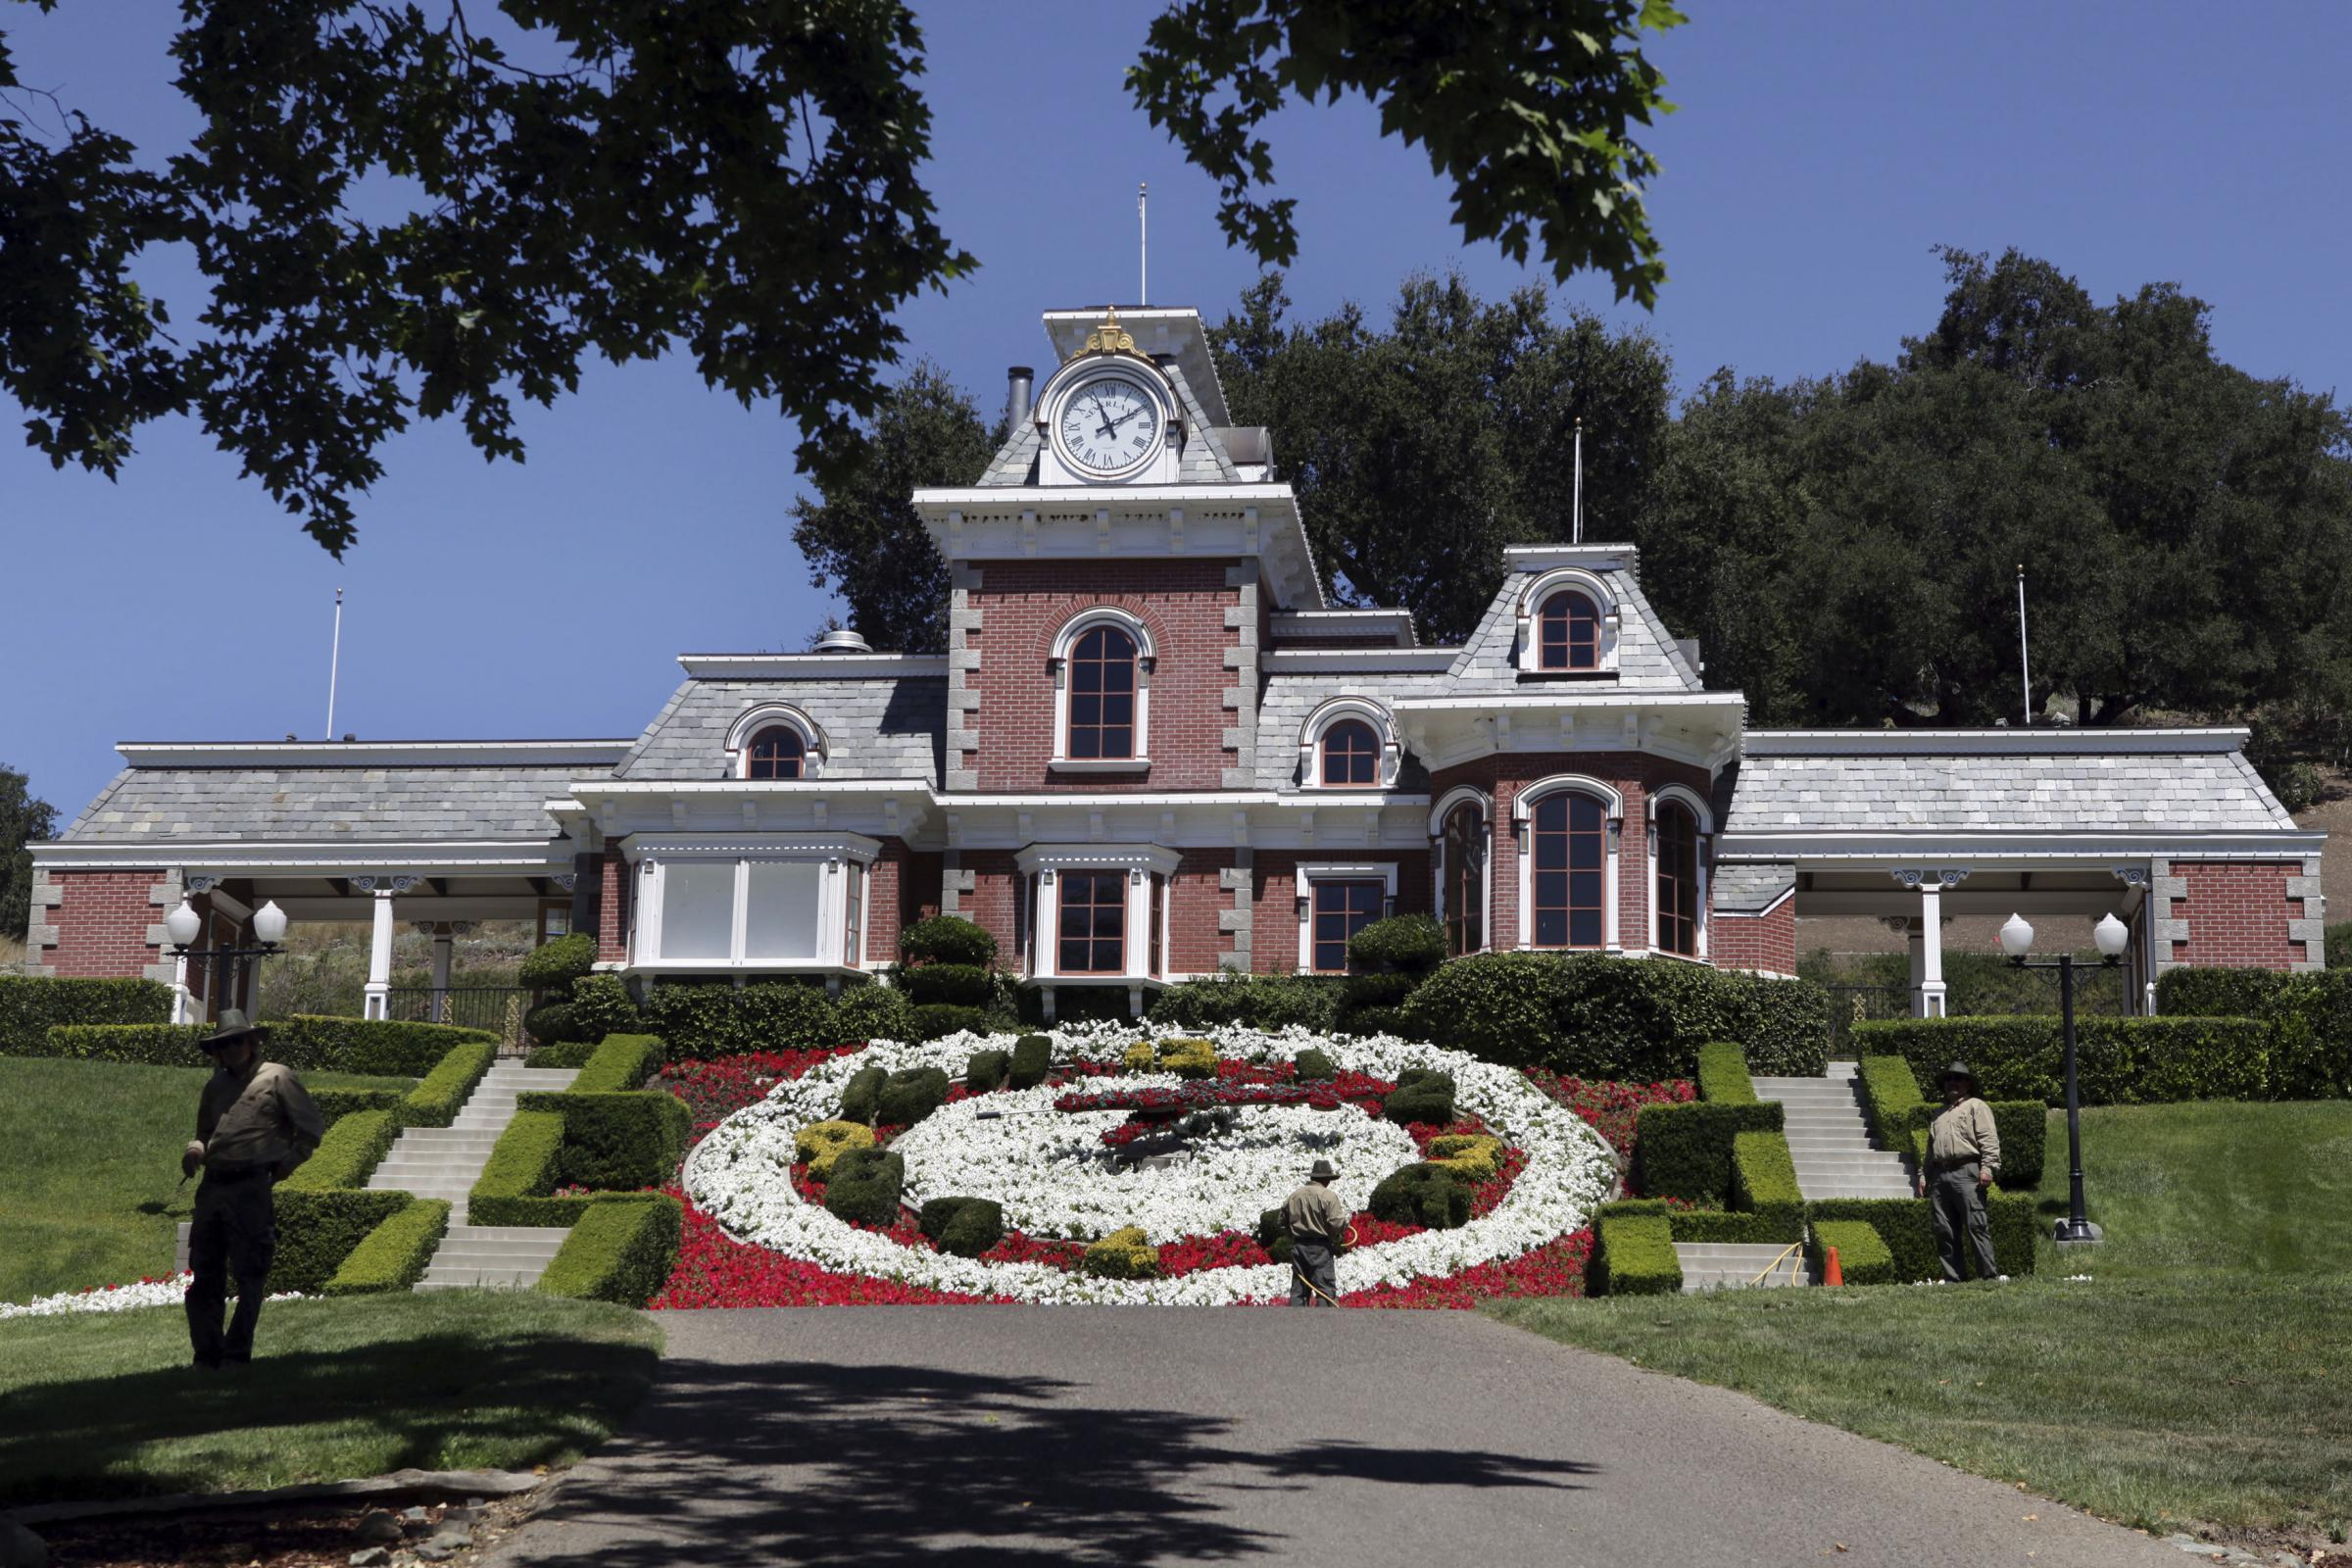 Michael Jackson's Neverland Ranch back